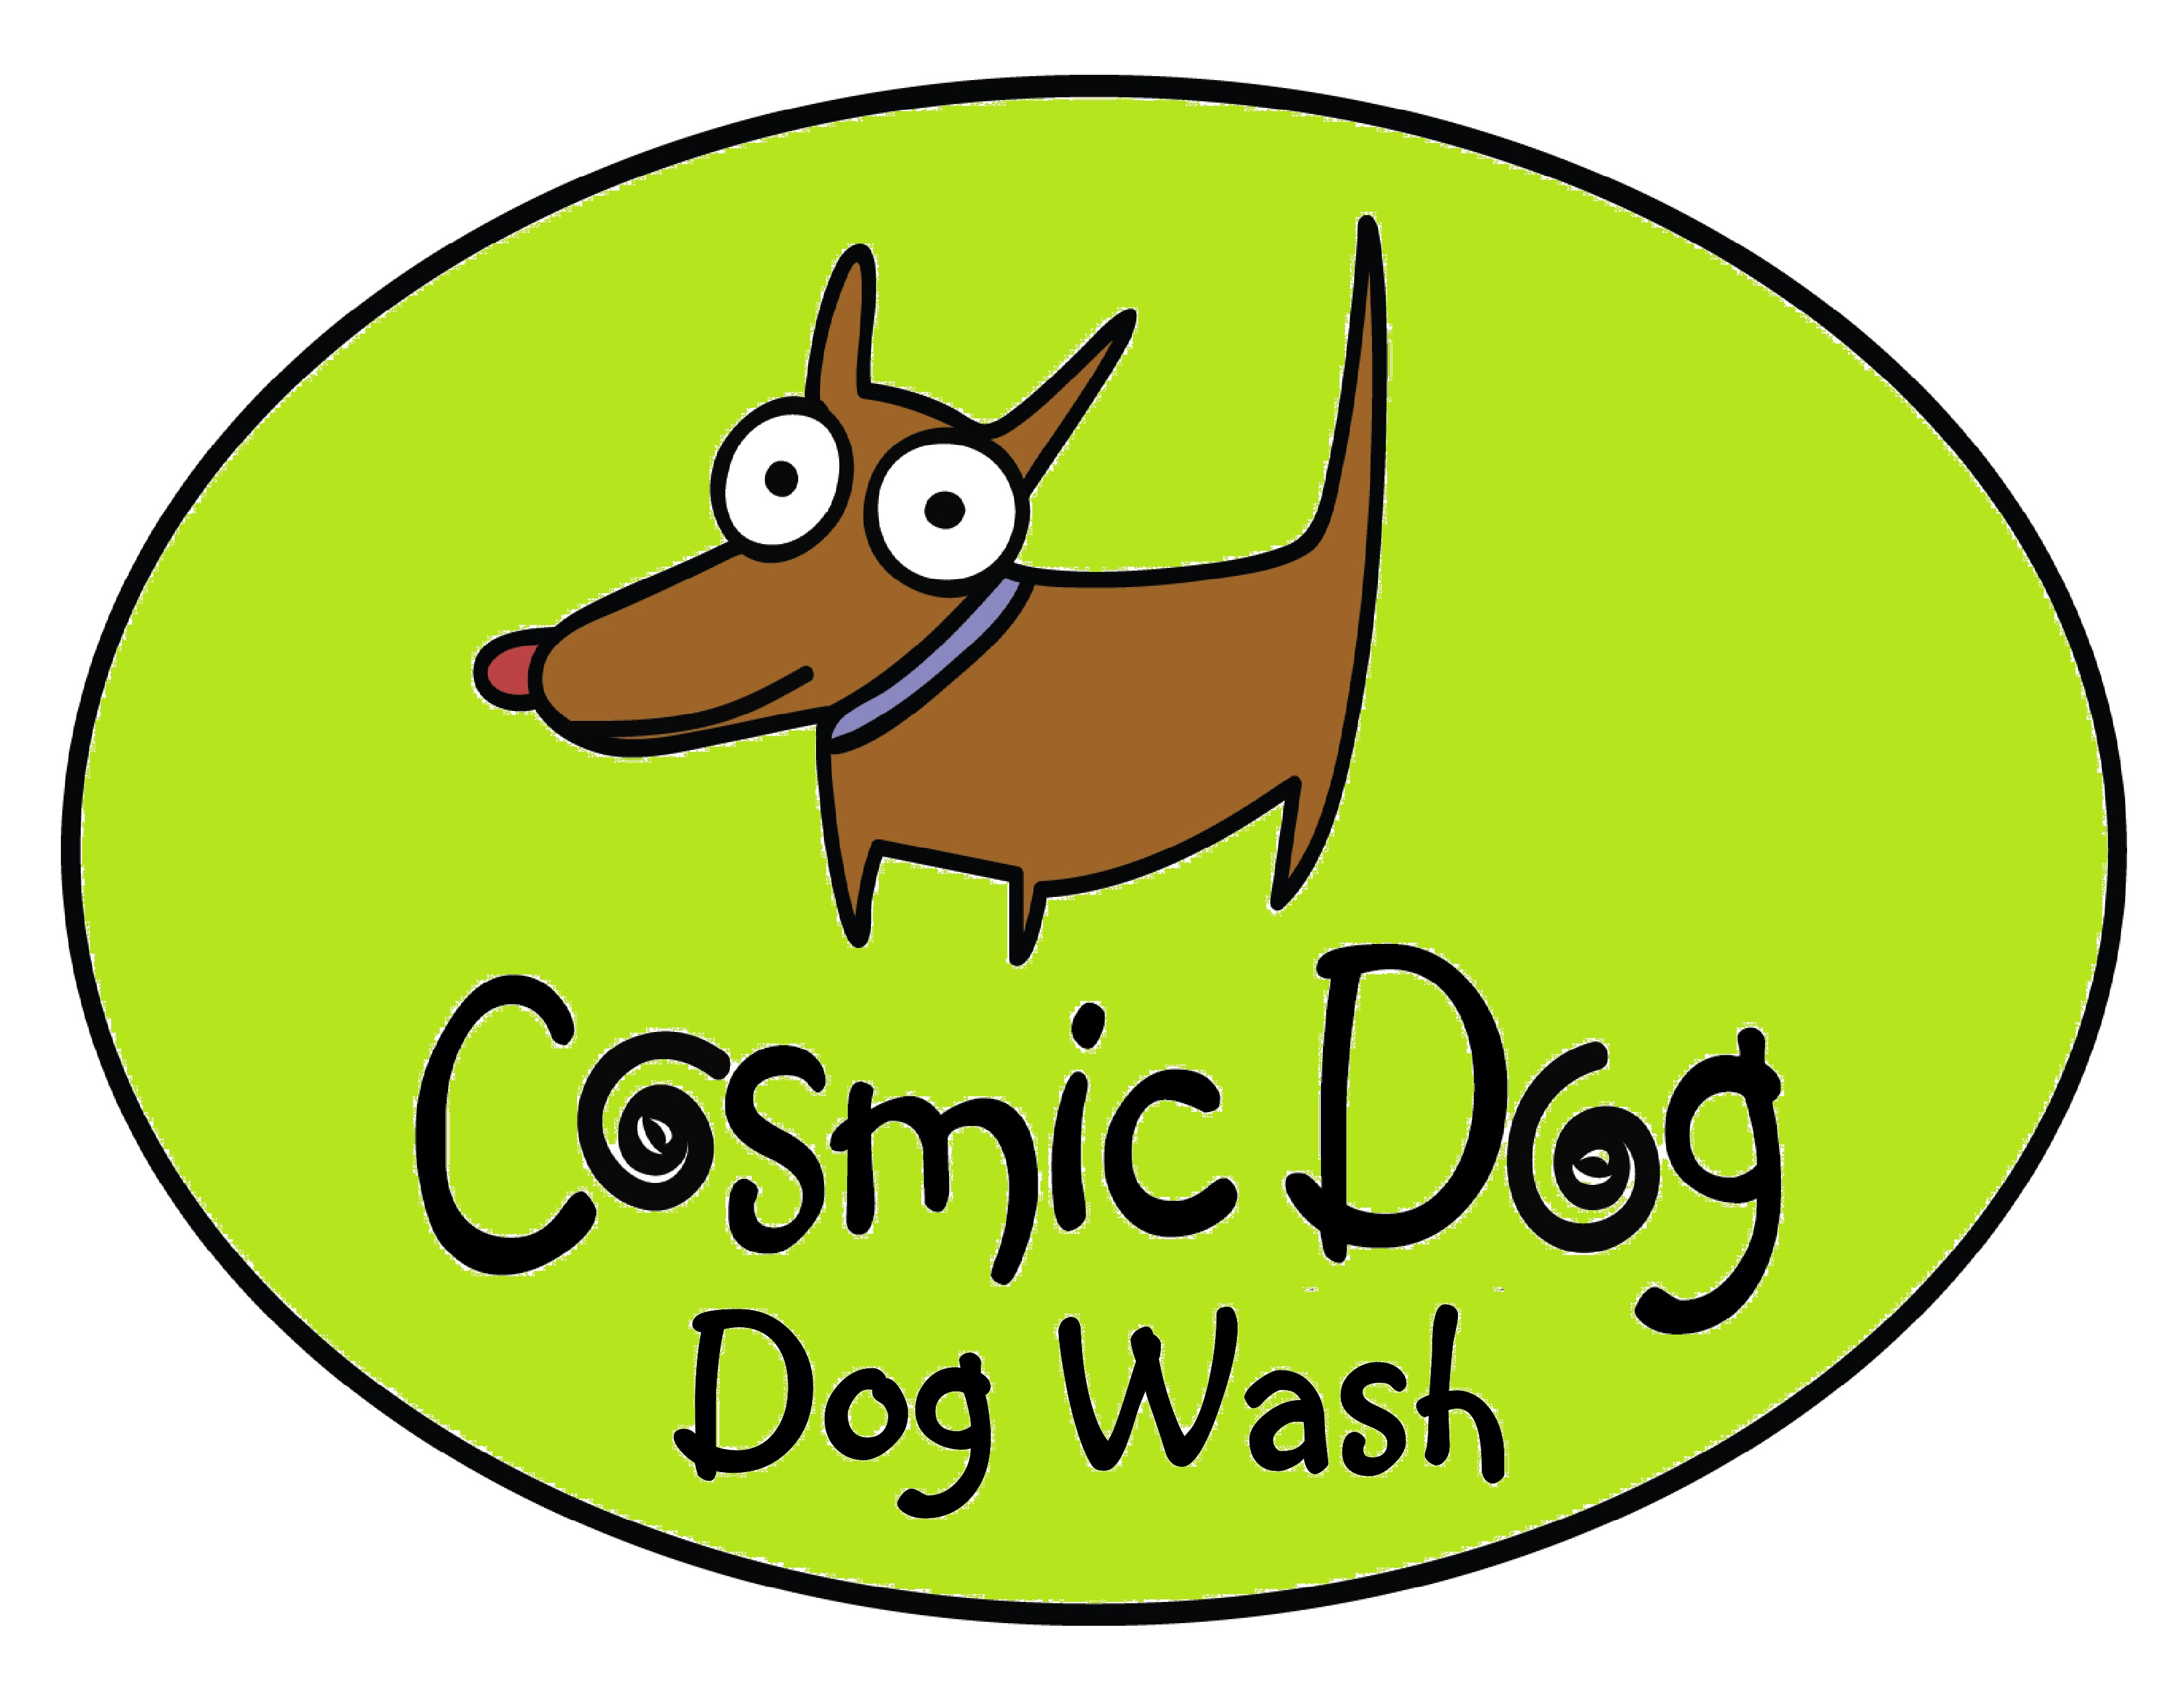 Cosmic dog solutioingenieria Choice Image